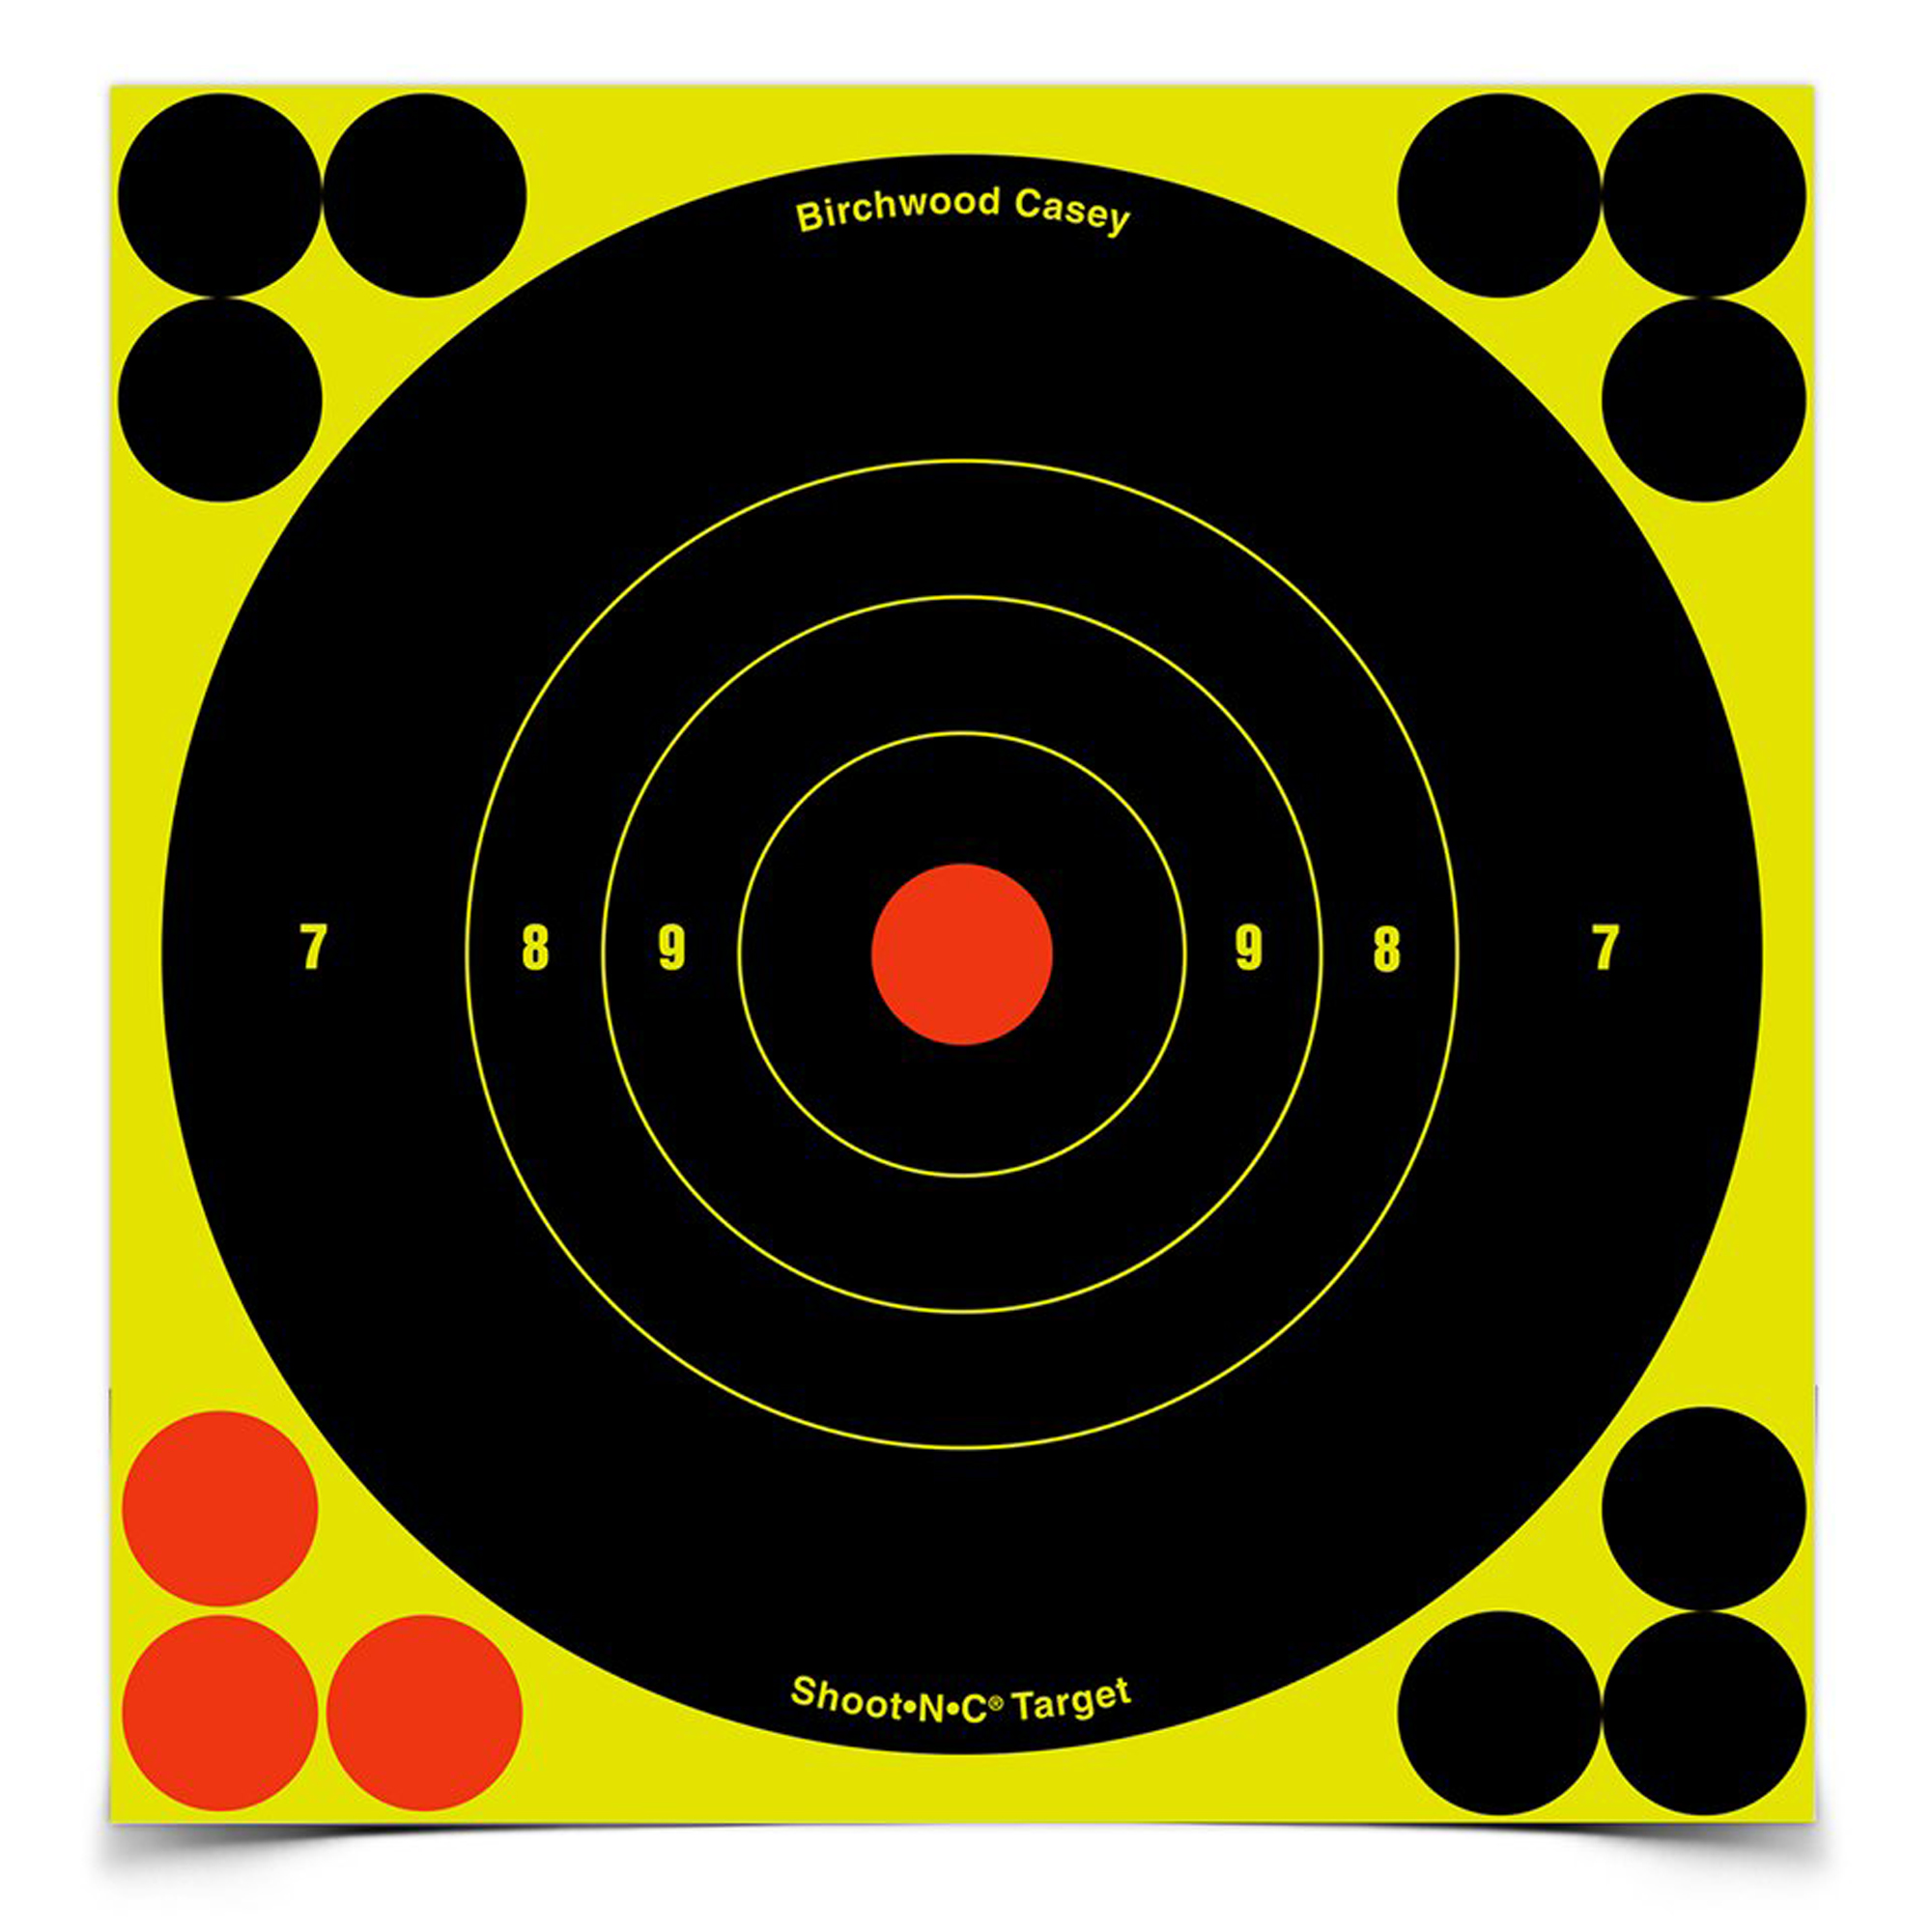 "B/c Sht-n-c Rnd Bullseye Tgt 60-6"""